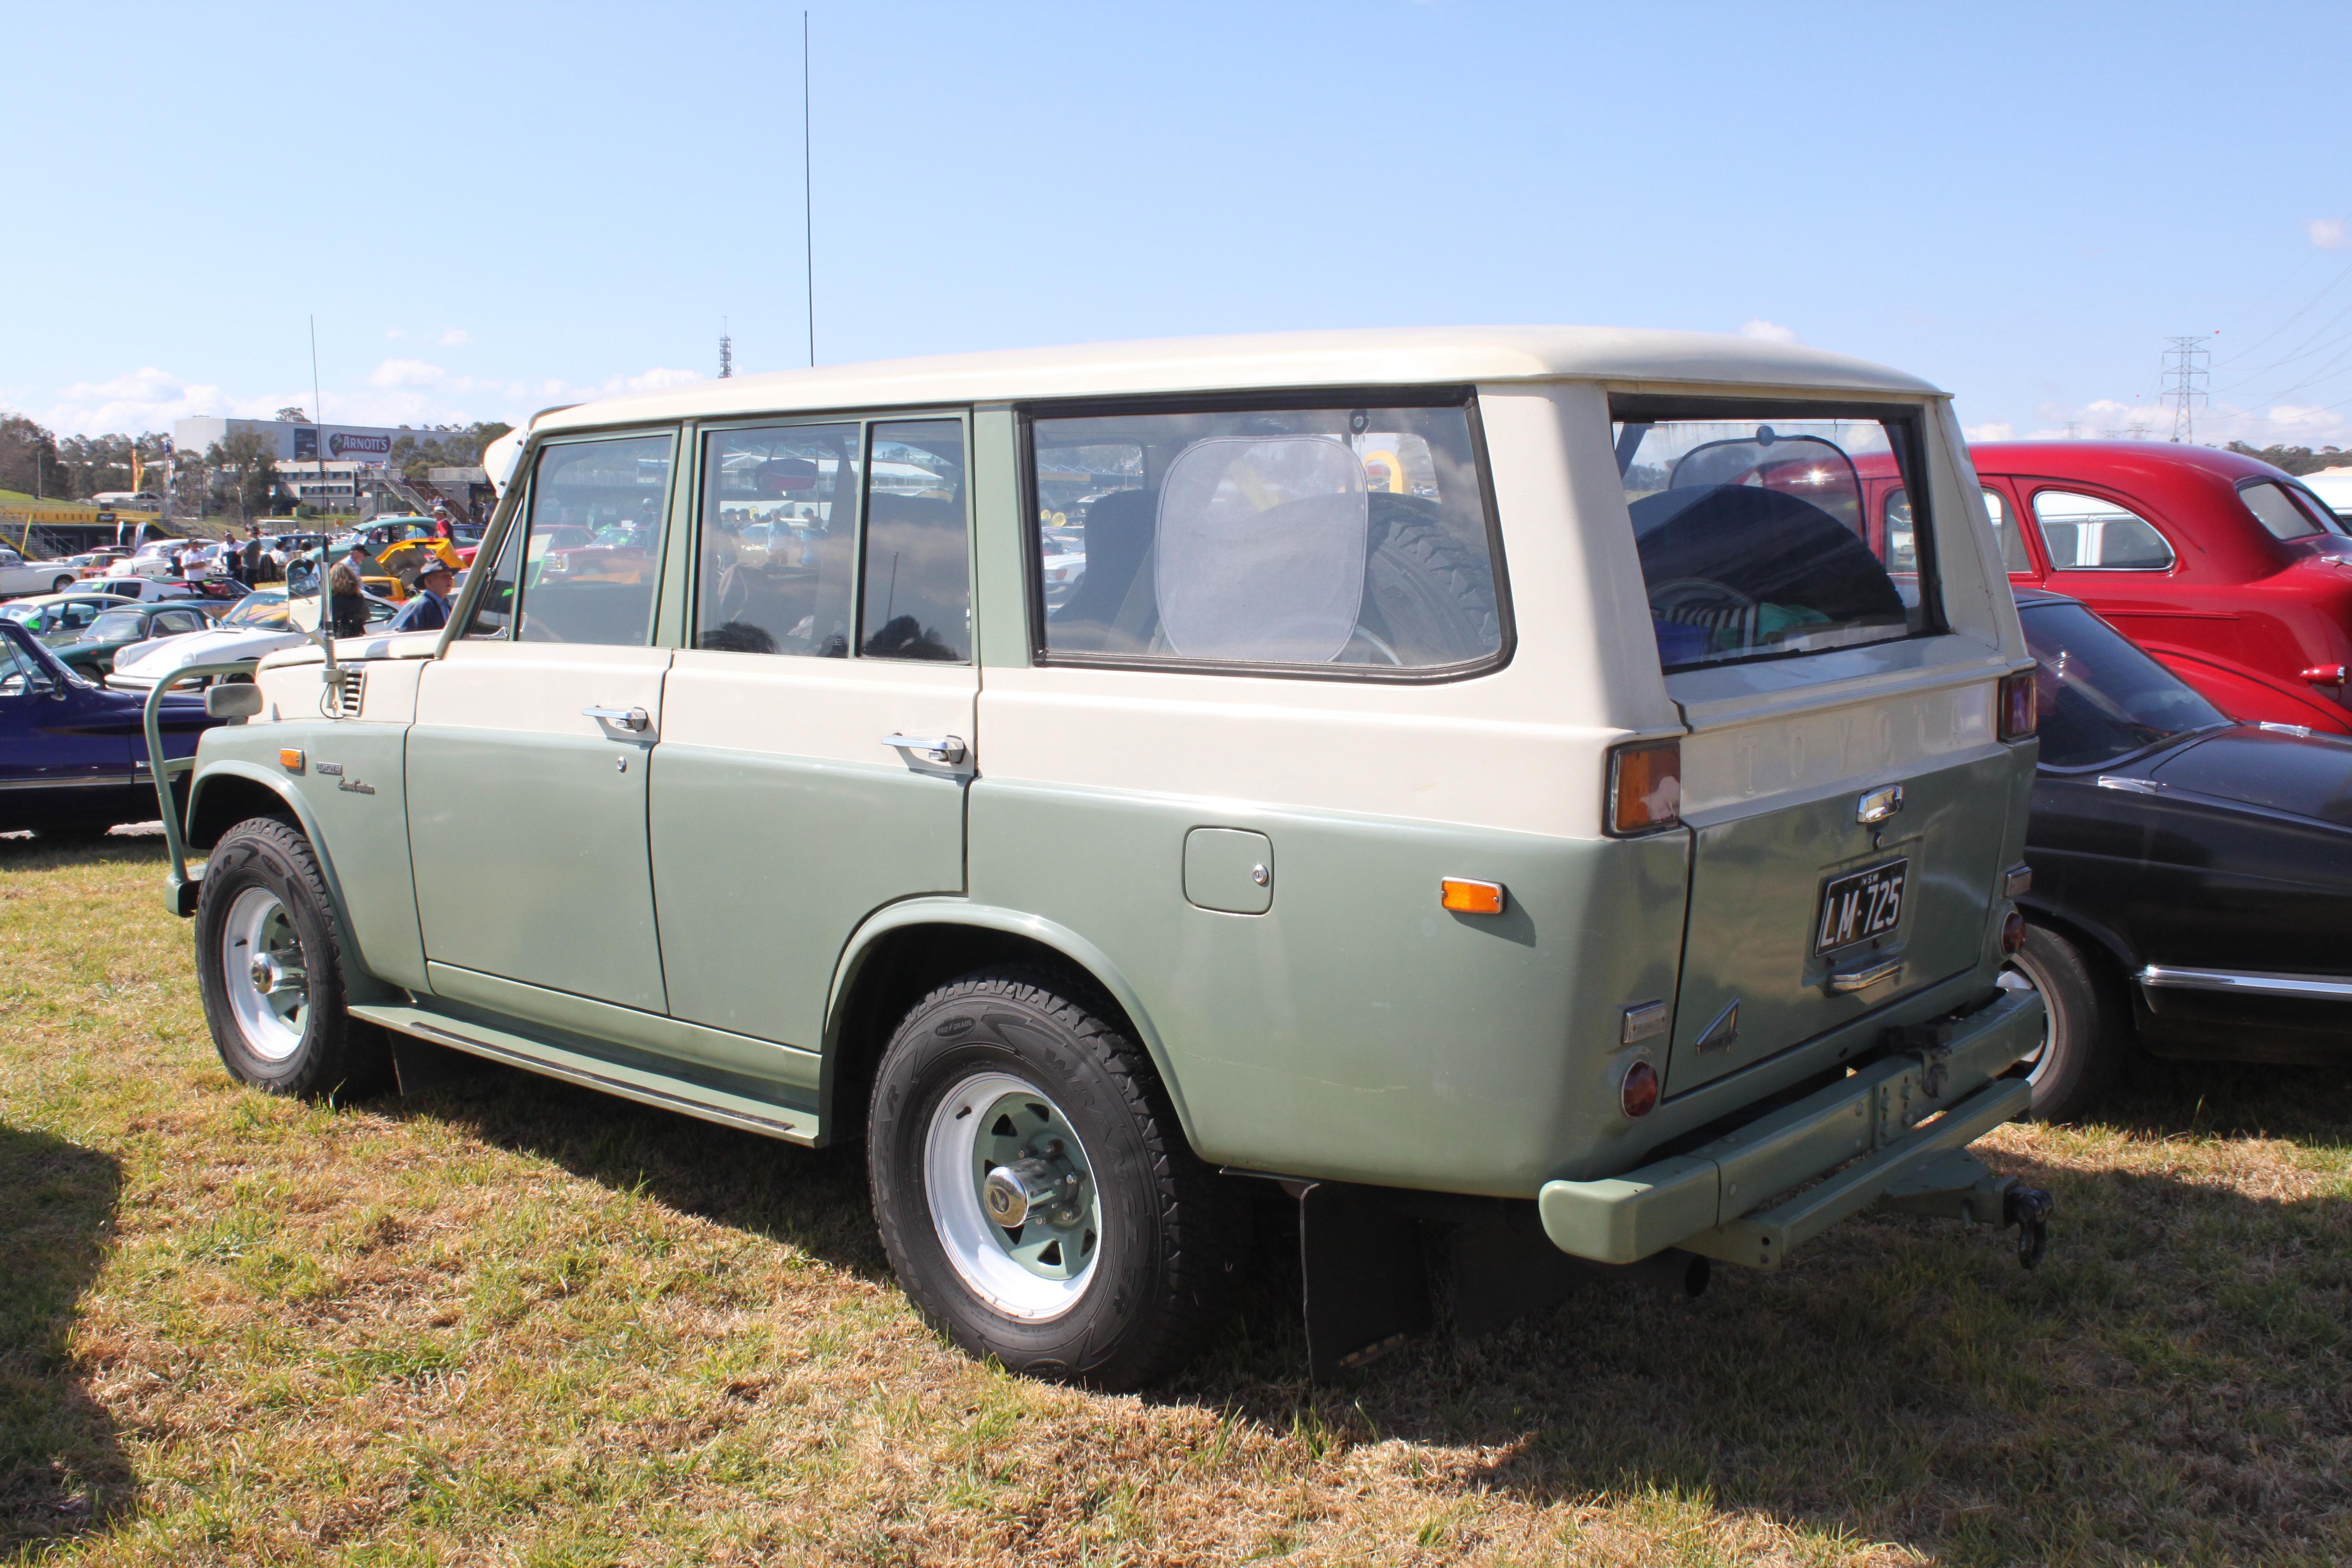 Toyota Land Cruiser Wiki >> File:1971 Toyota Land Cruiser (FJ55) wagon (21219390030).jpg - Wikimedia Commons